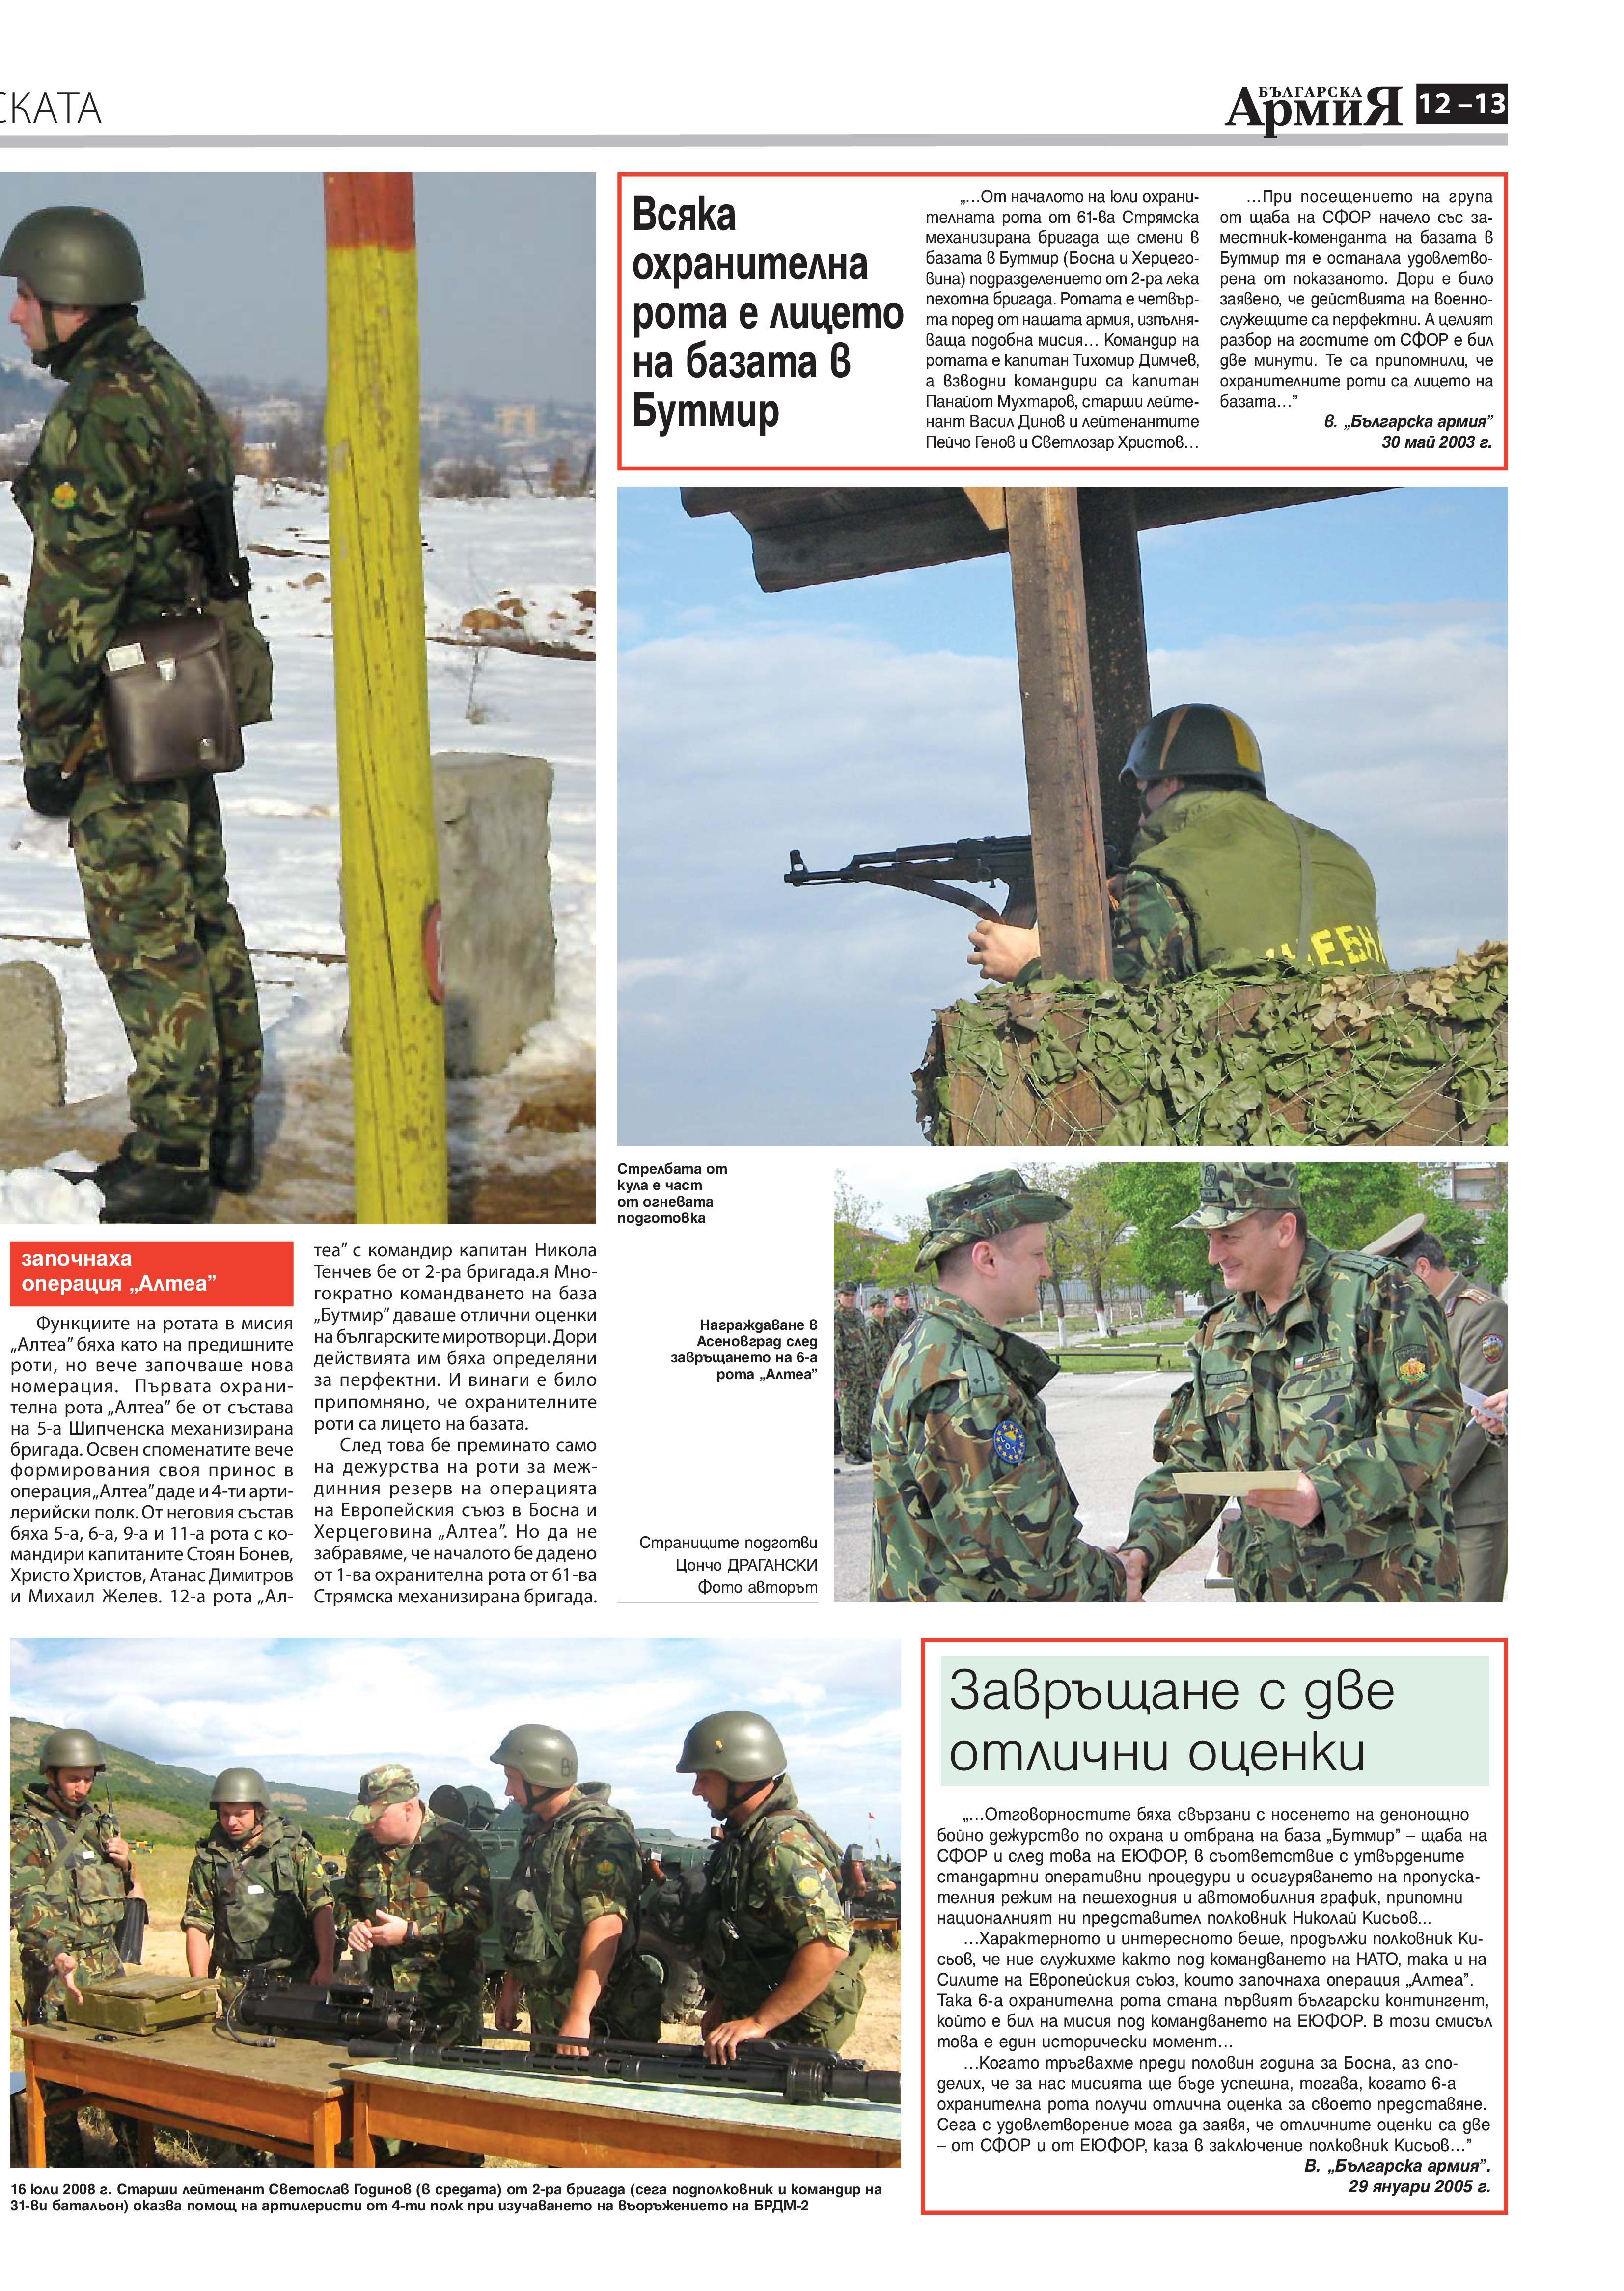 https://www.armymedia.bg/wp-content/uploads/2015/06/13-52.jpg